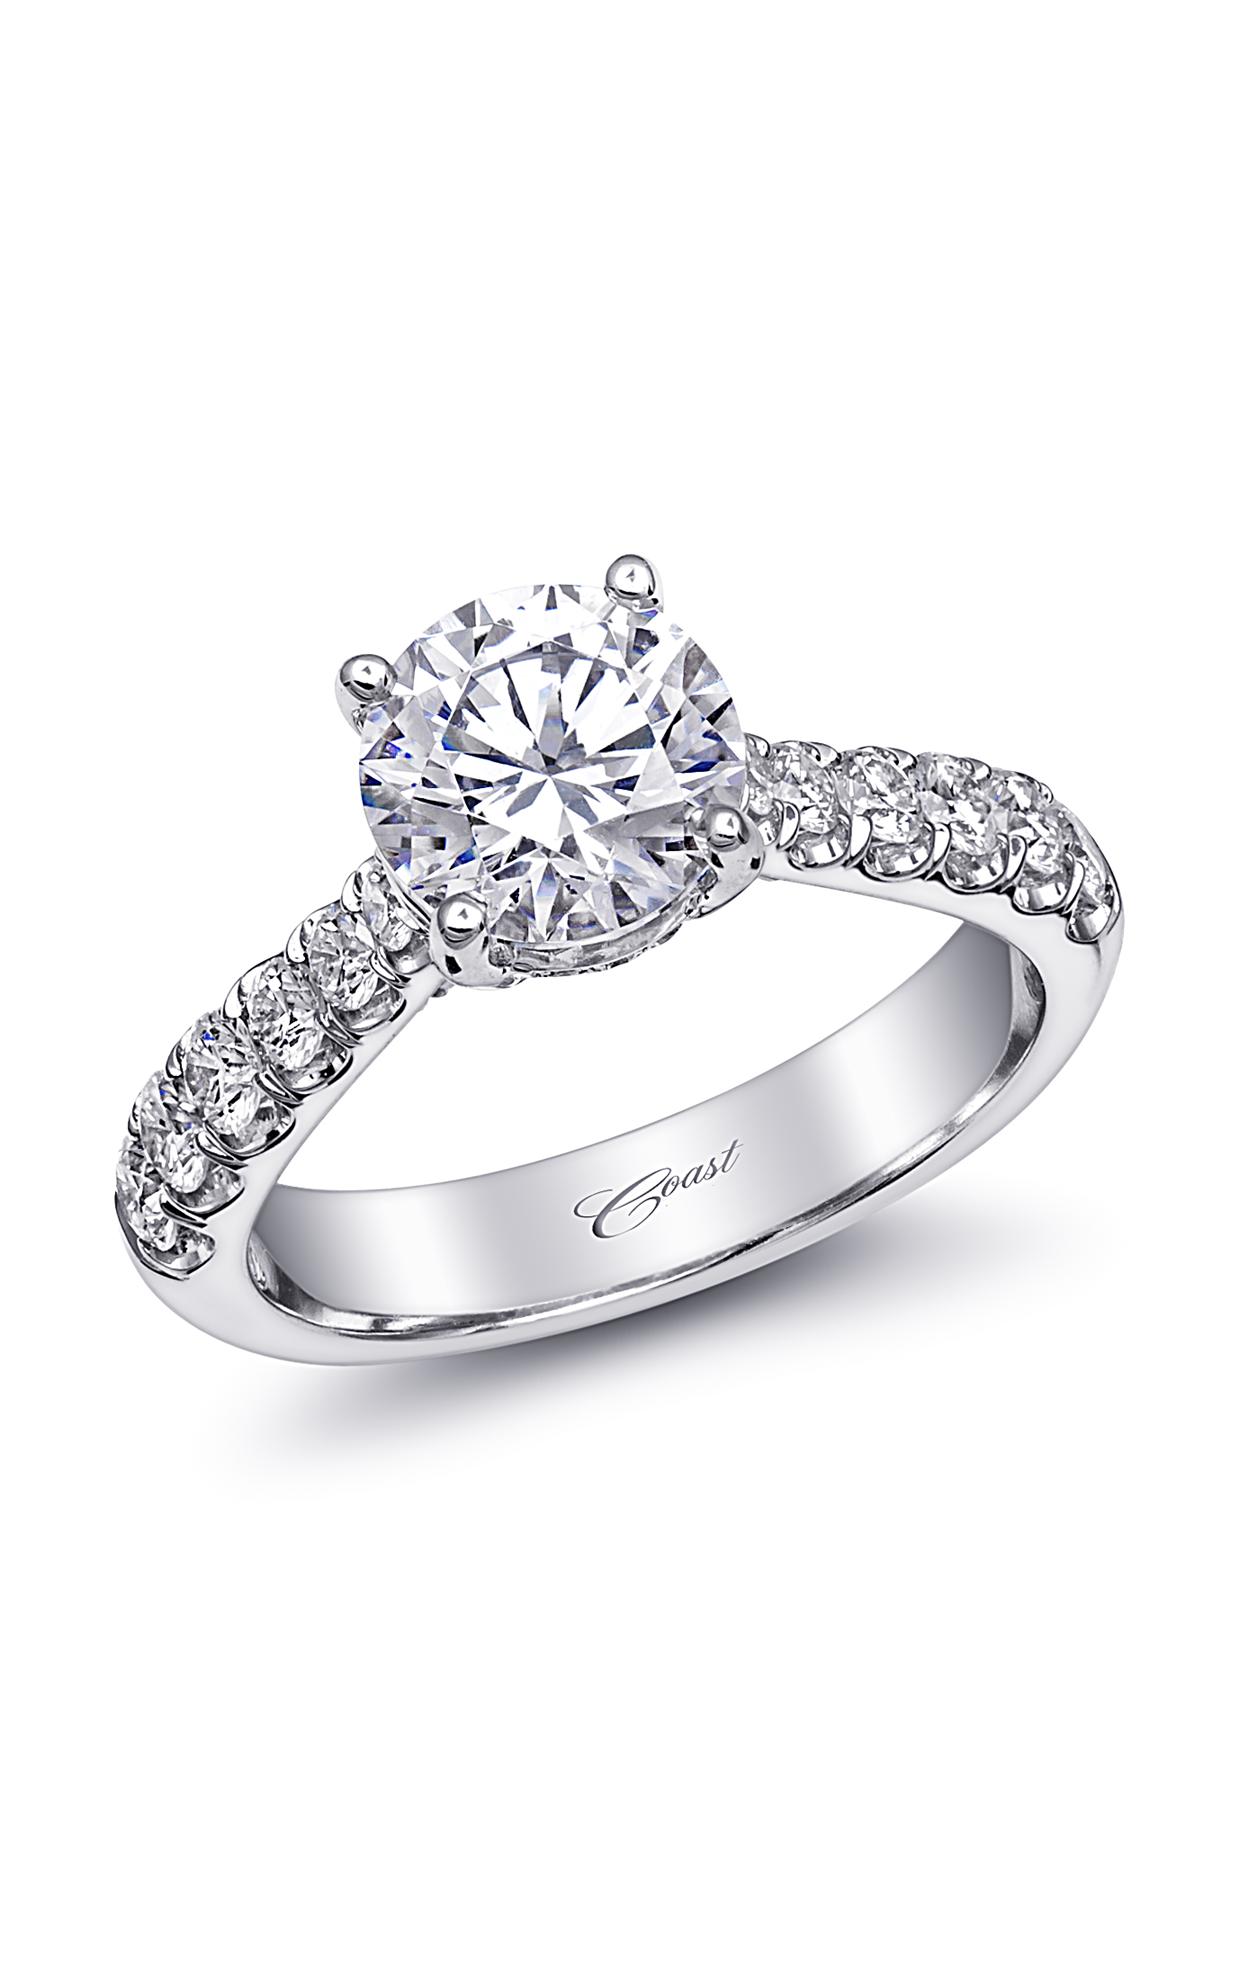 Coast Diamond Charisma LS10170 product image